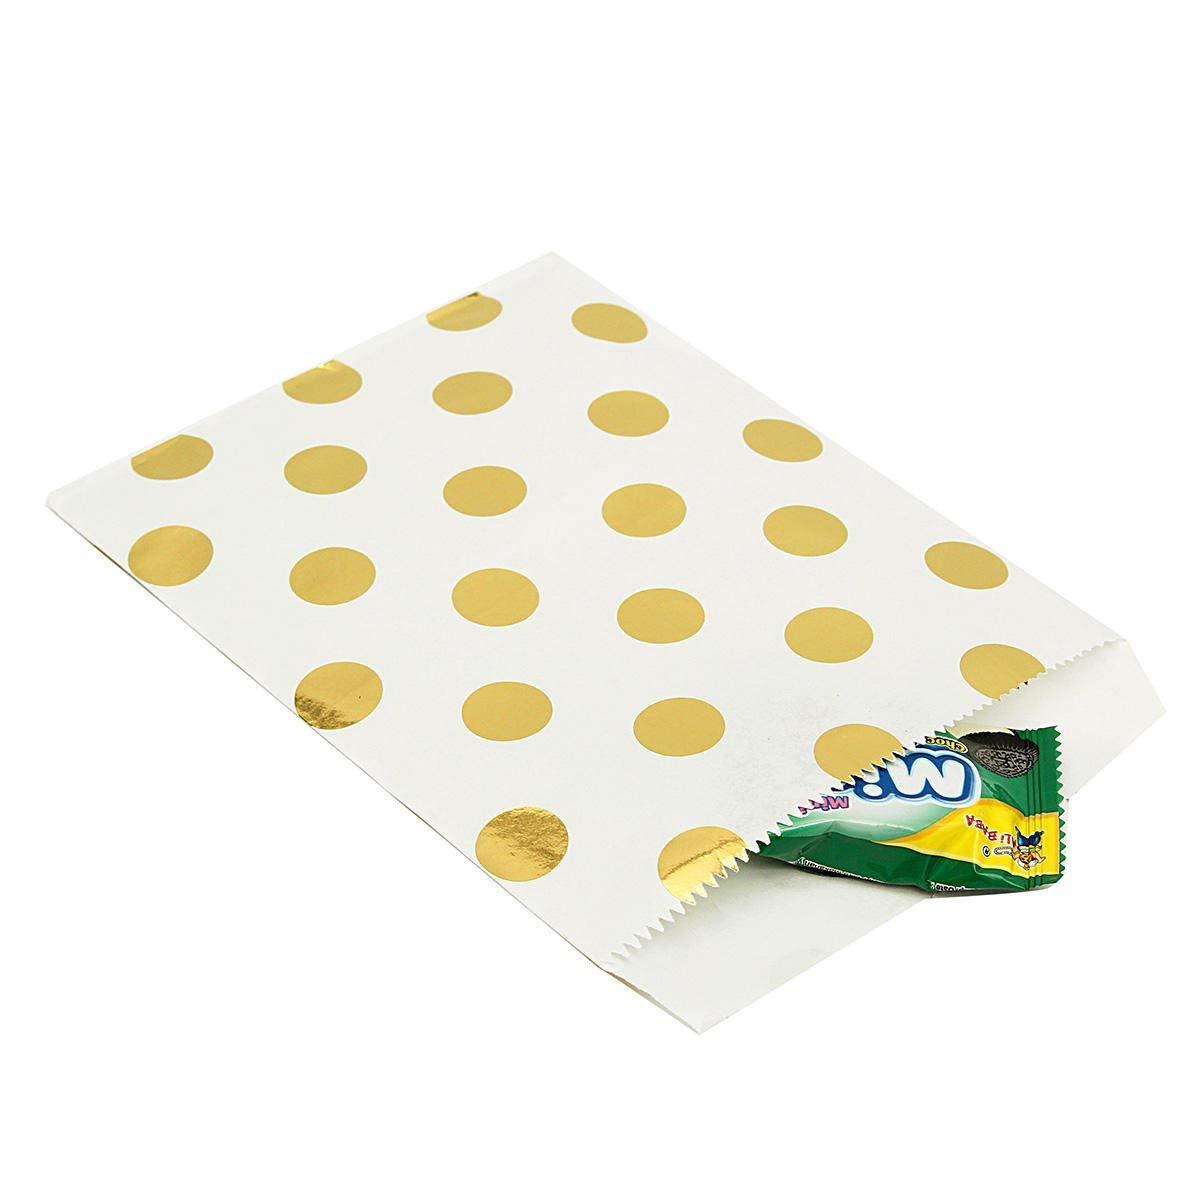 image about Printable Gold Foil Paper named Affordable Printable Gold Foil Paper, uncover Printable Gold Foil